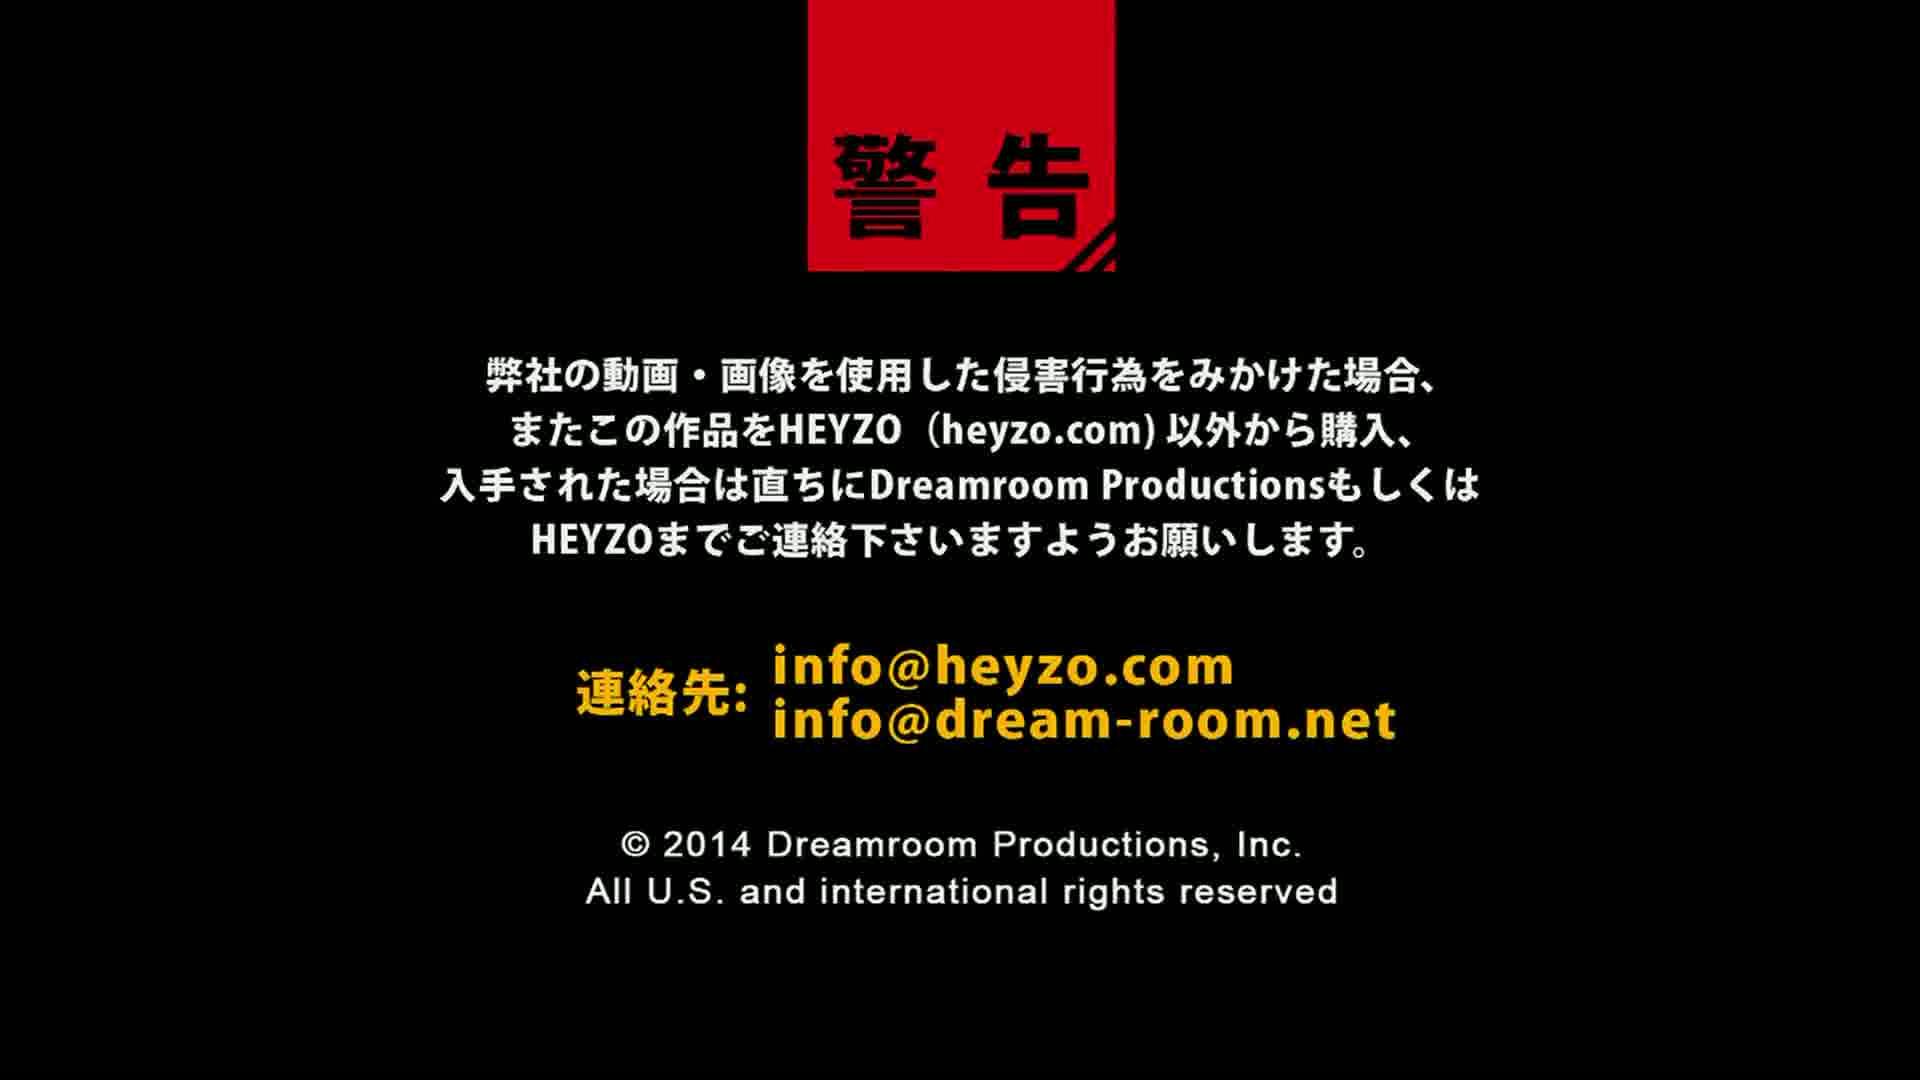 HAMEZO~ハメ撮りコレクション~vol.20 - 遠野しほ【バック 電マ オシッコ 側位 中出し】